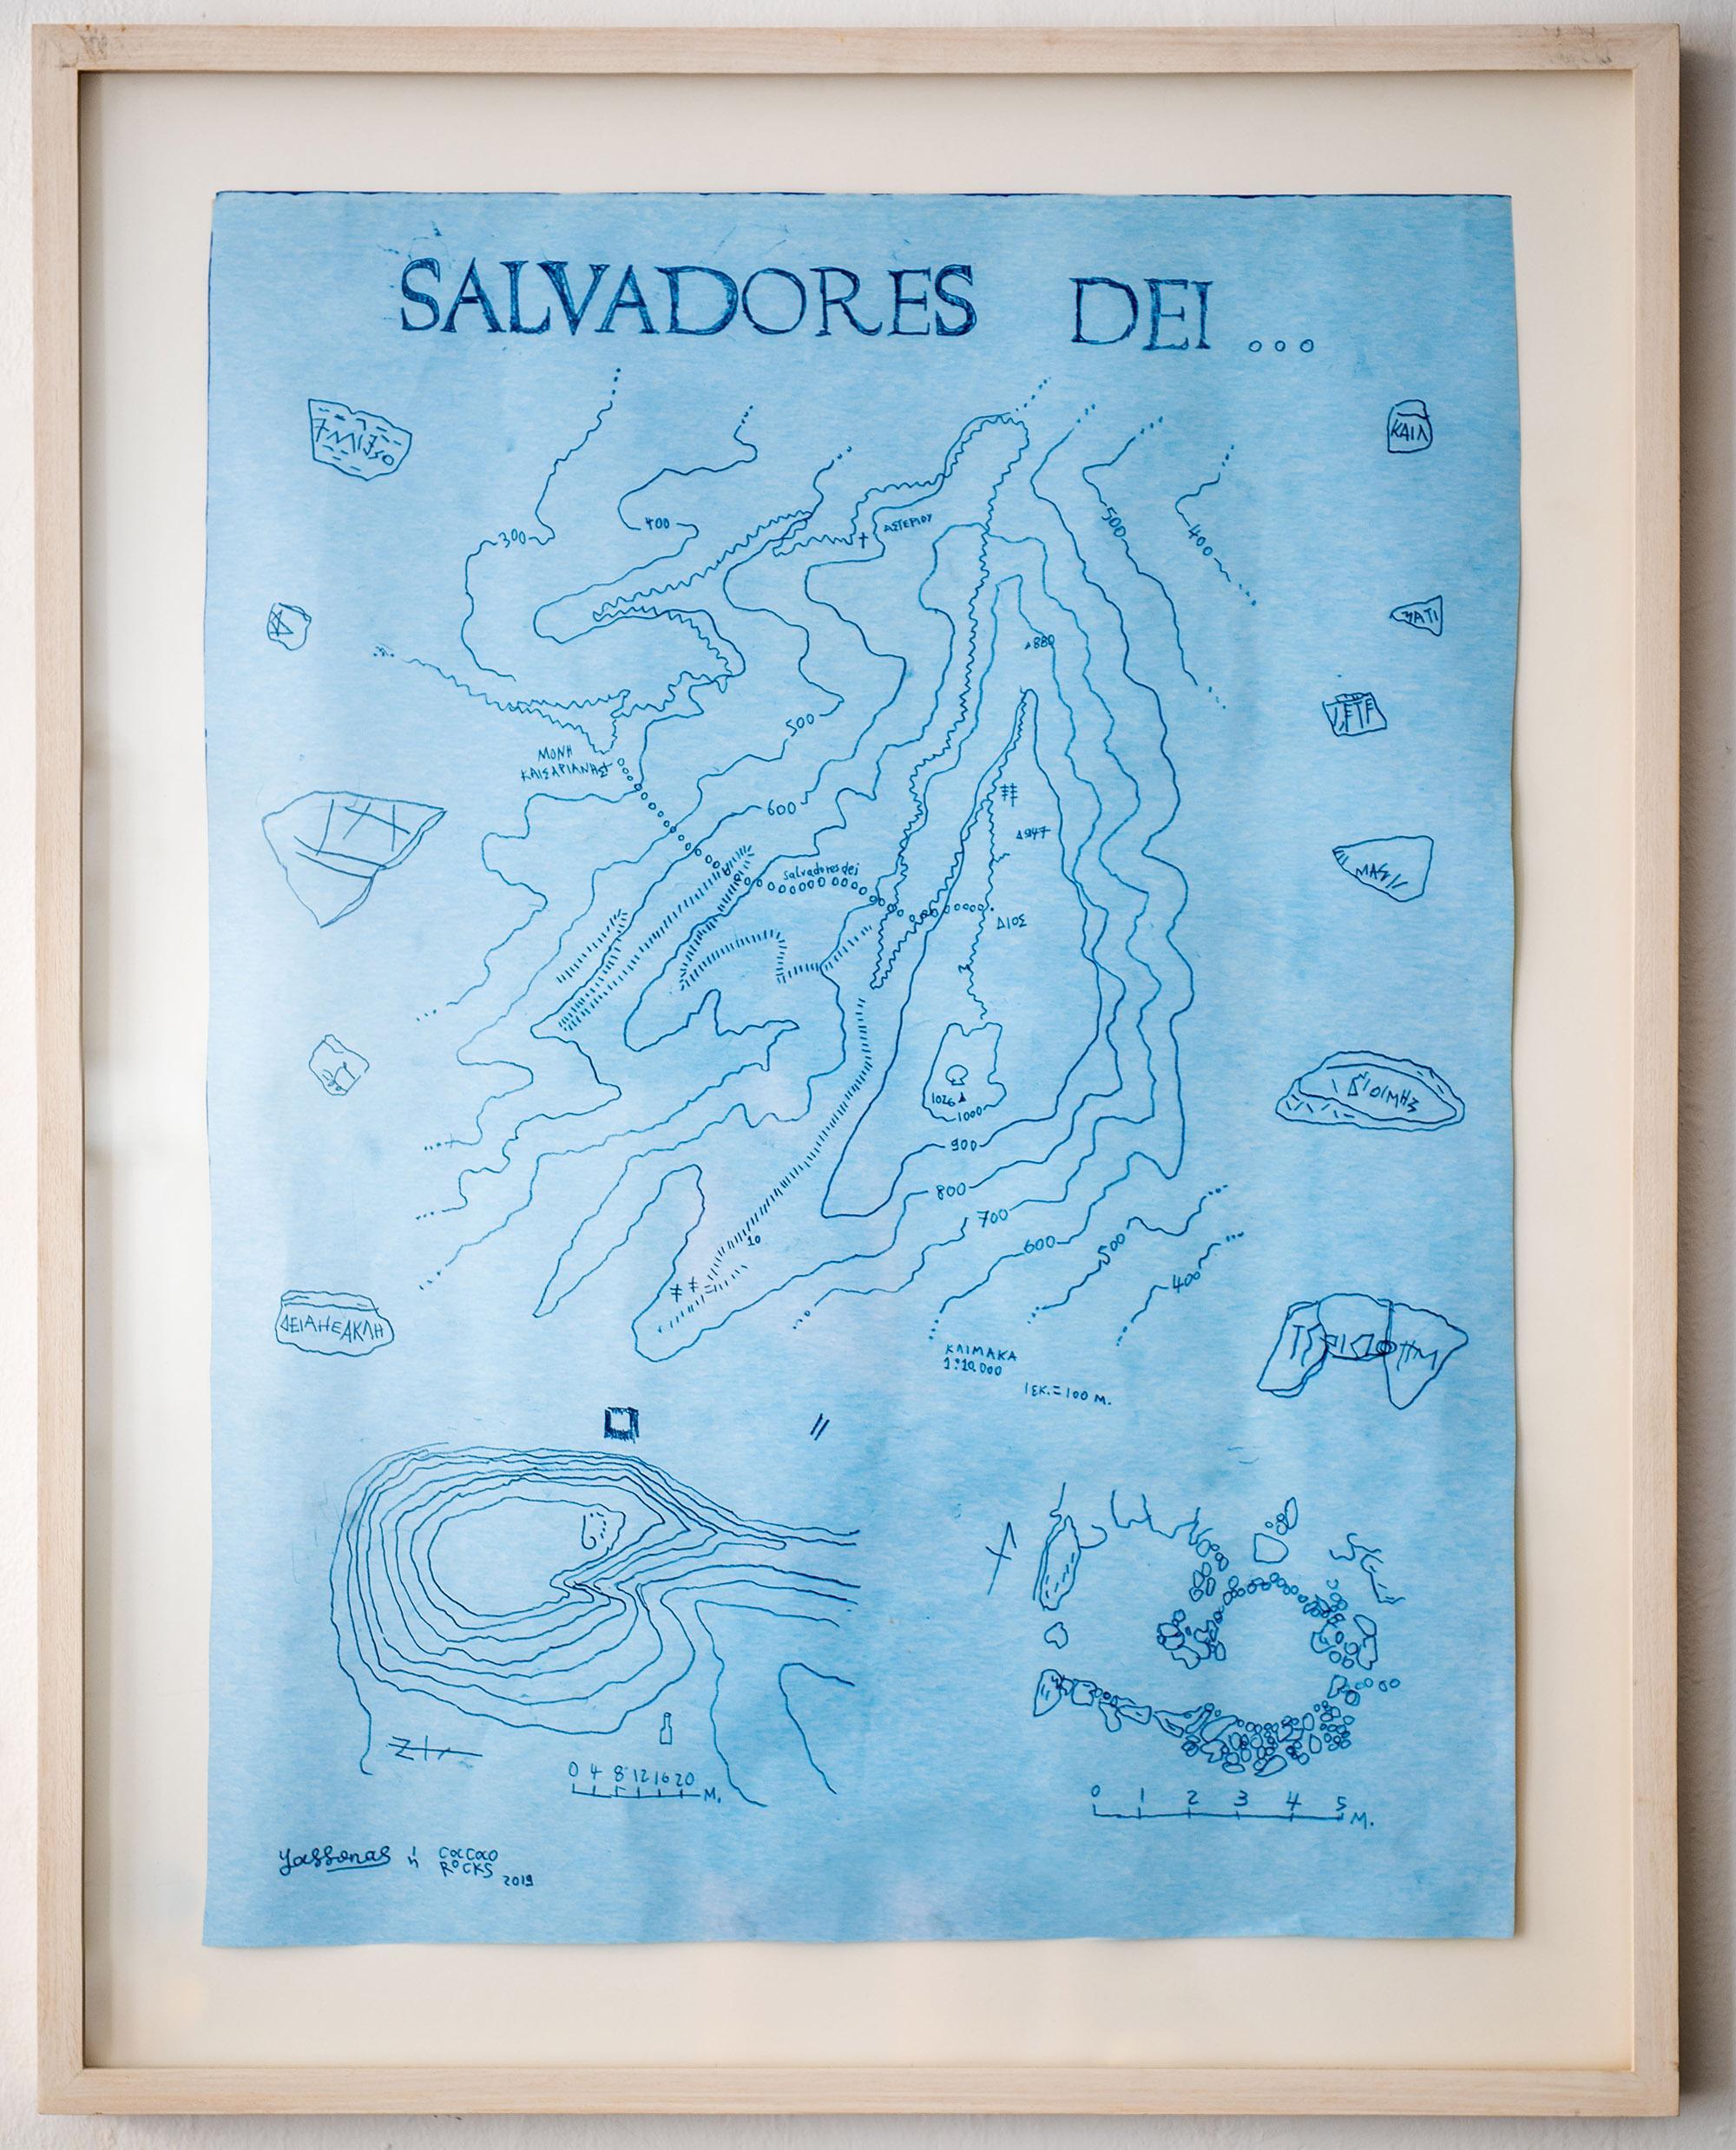 Cacao Rocks: Salvadores Dei - Ep. 1 - Image 14